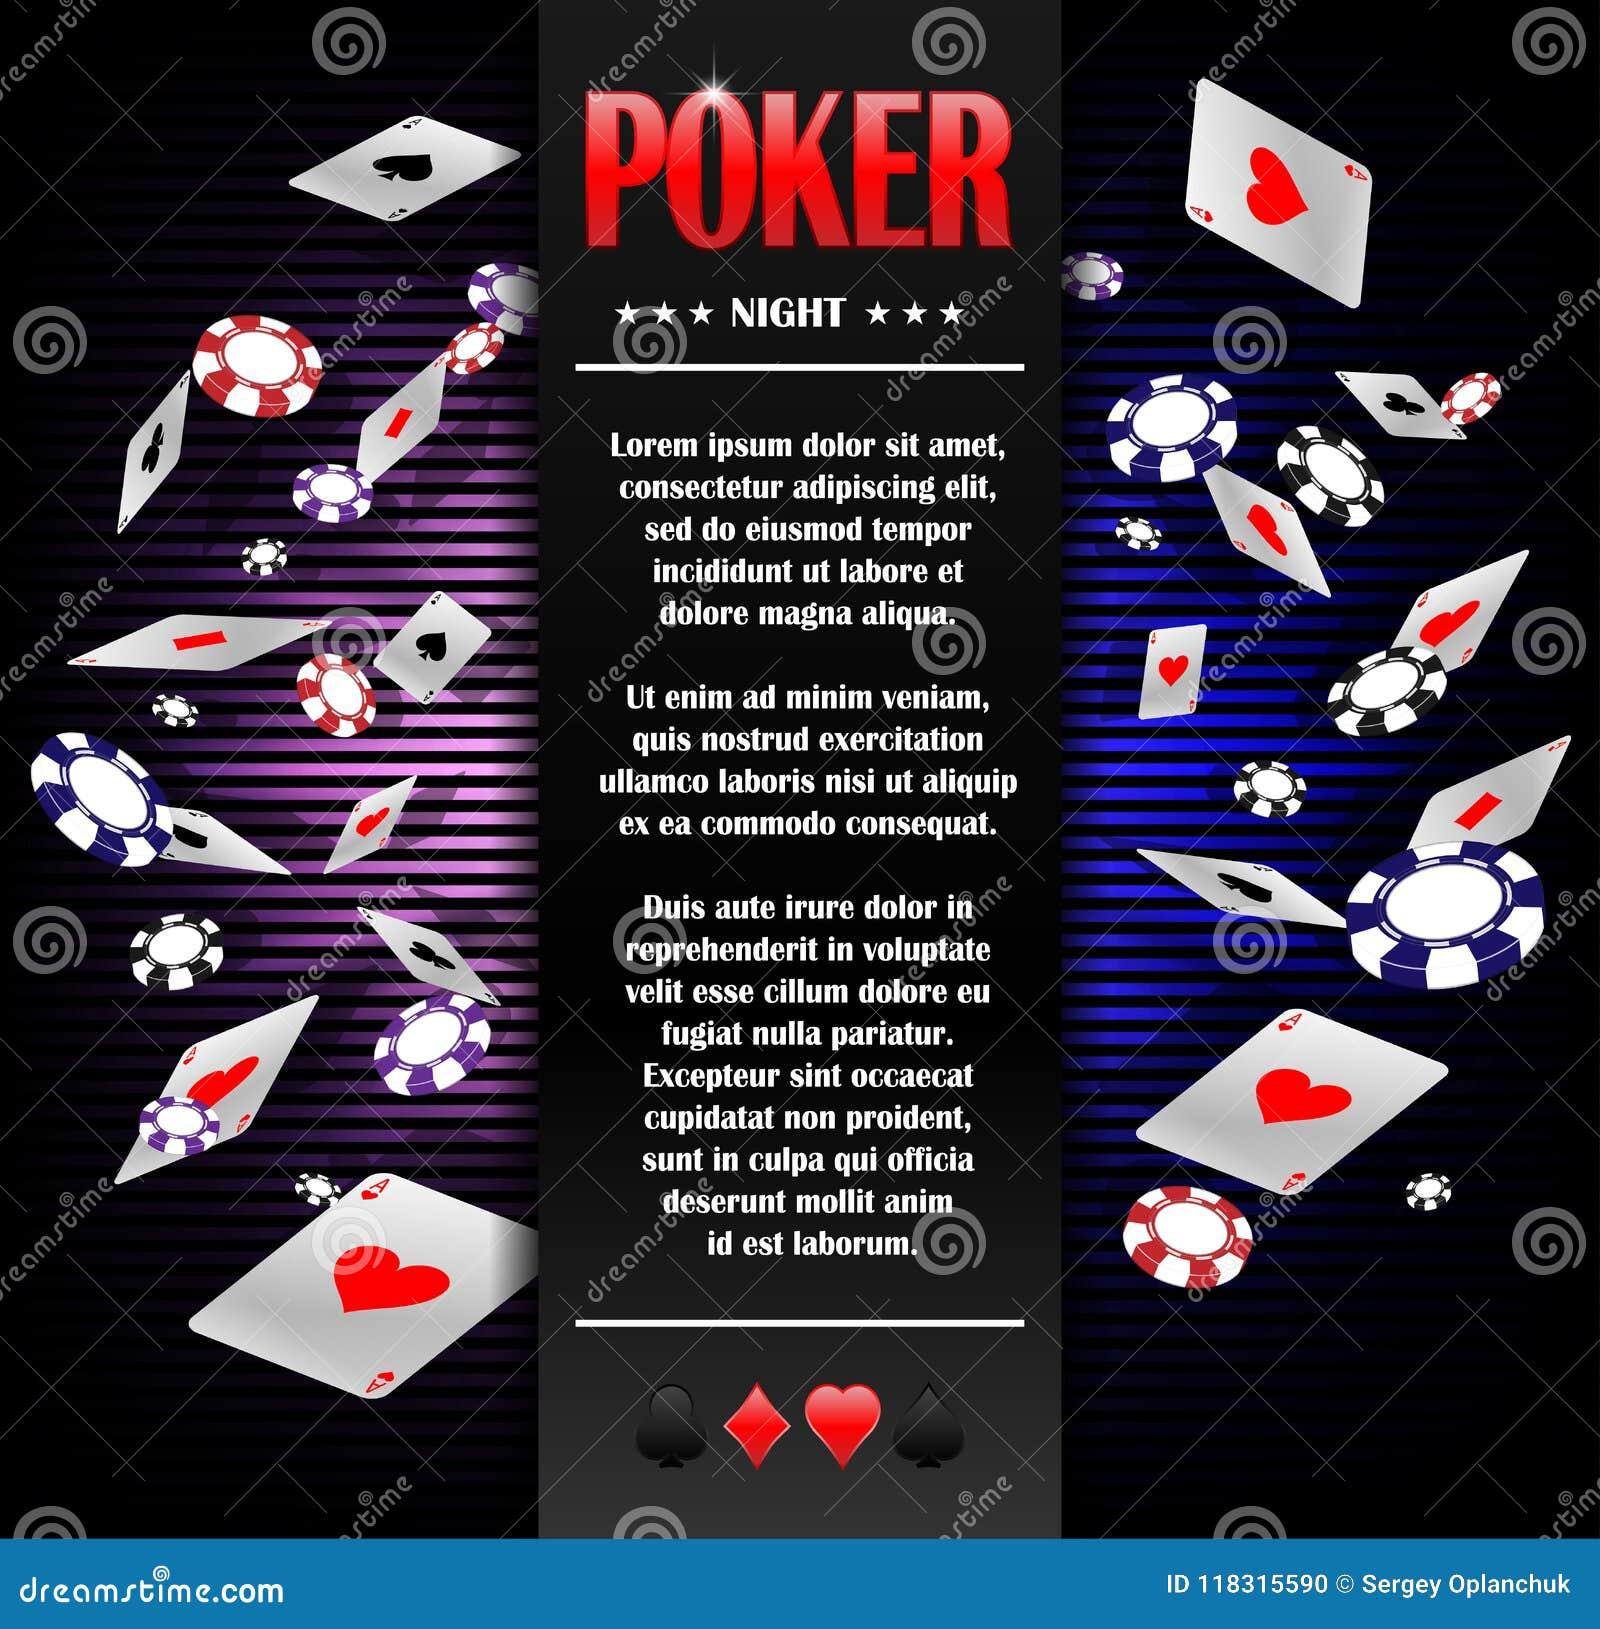 nitrogen poker review